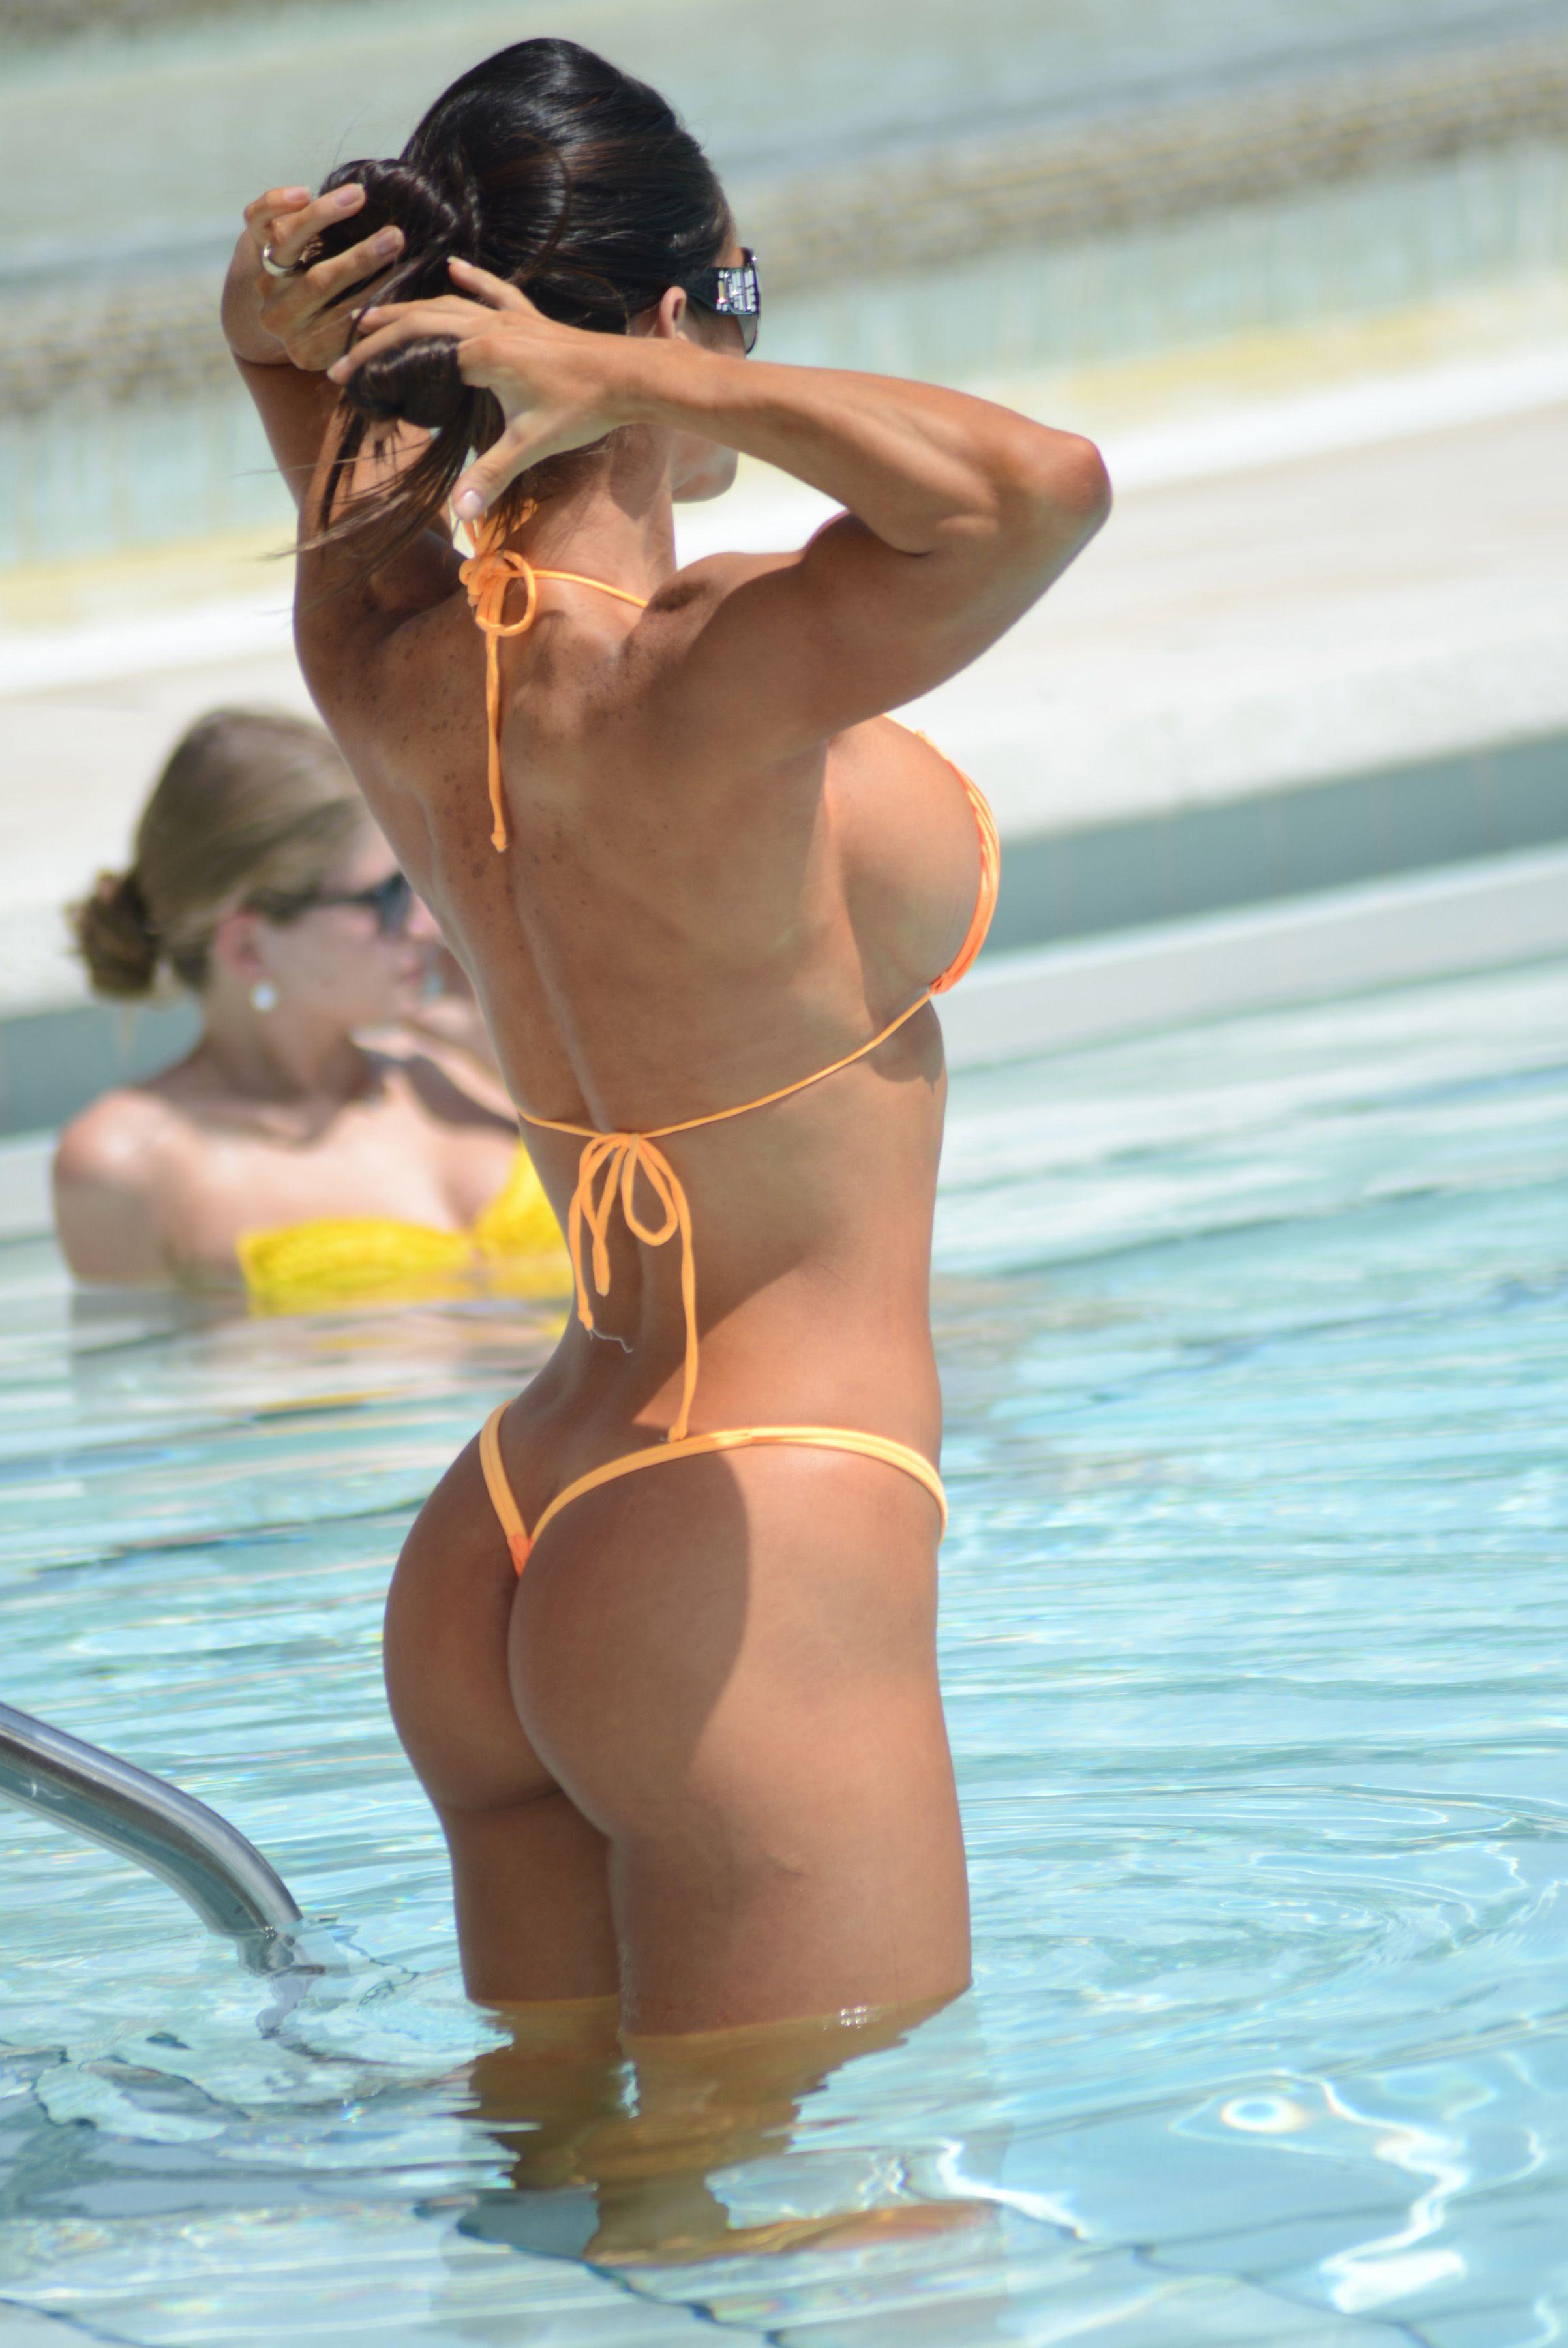 string-bikini-ass-pics